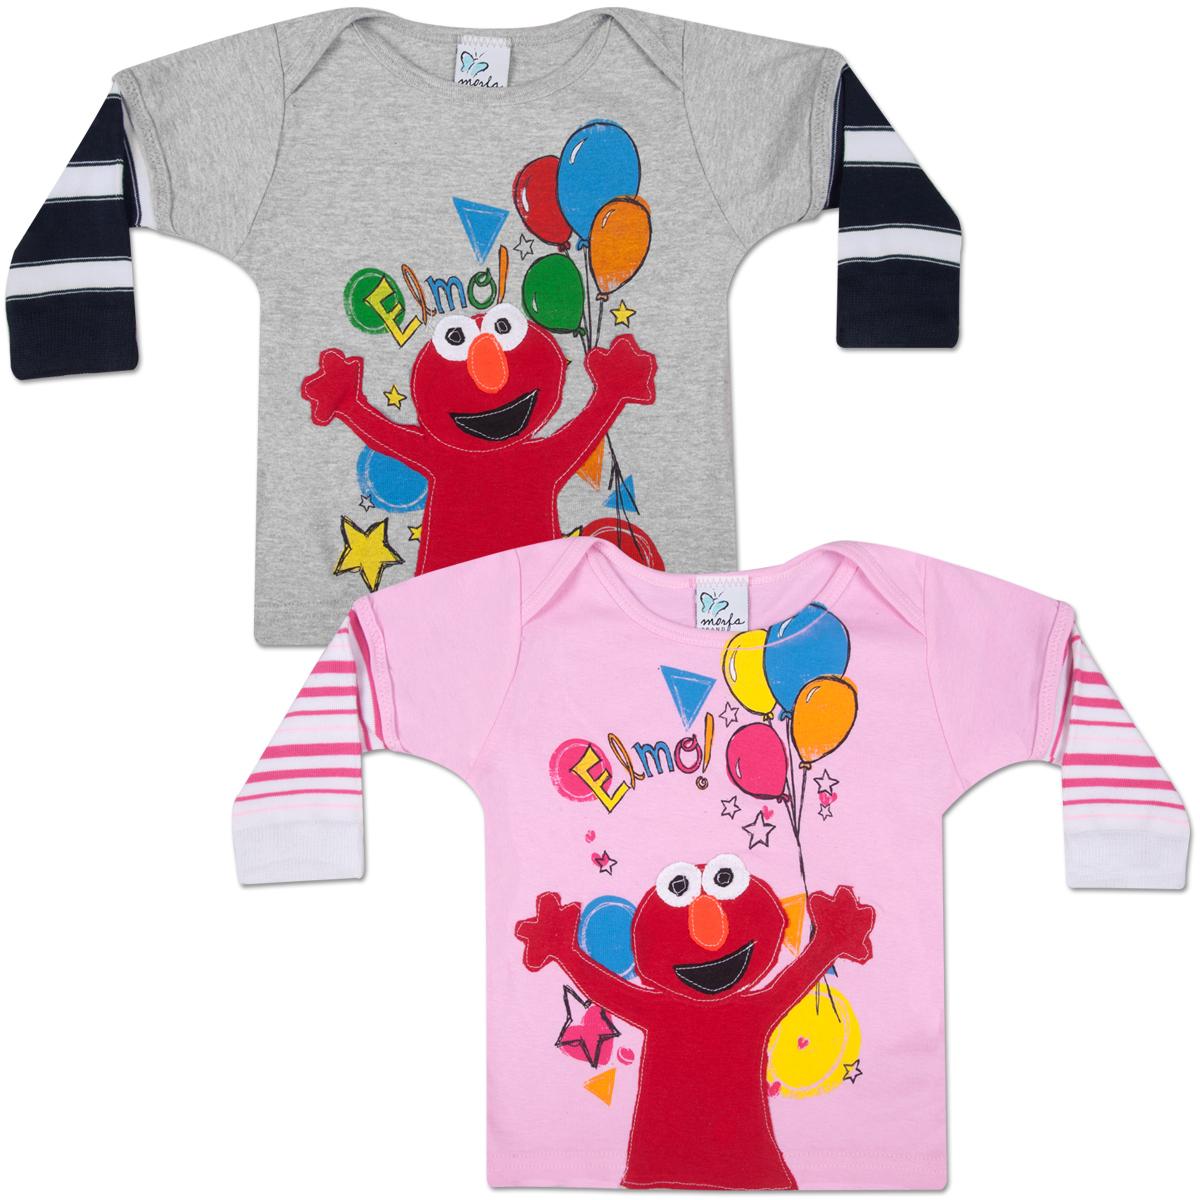 MORFS Elmo Party Time Infant Sock T-shirt